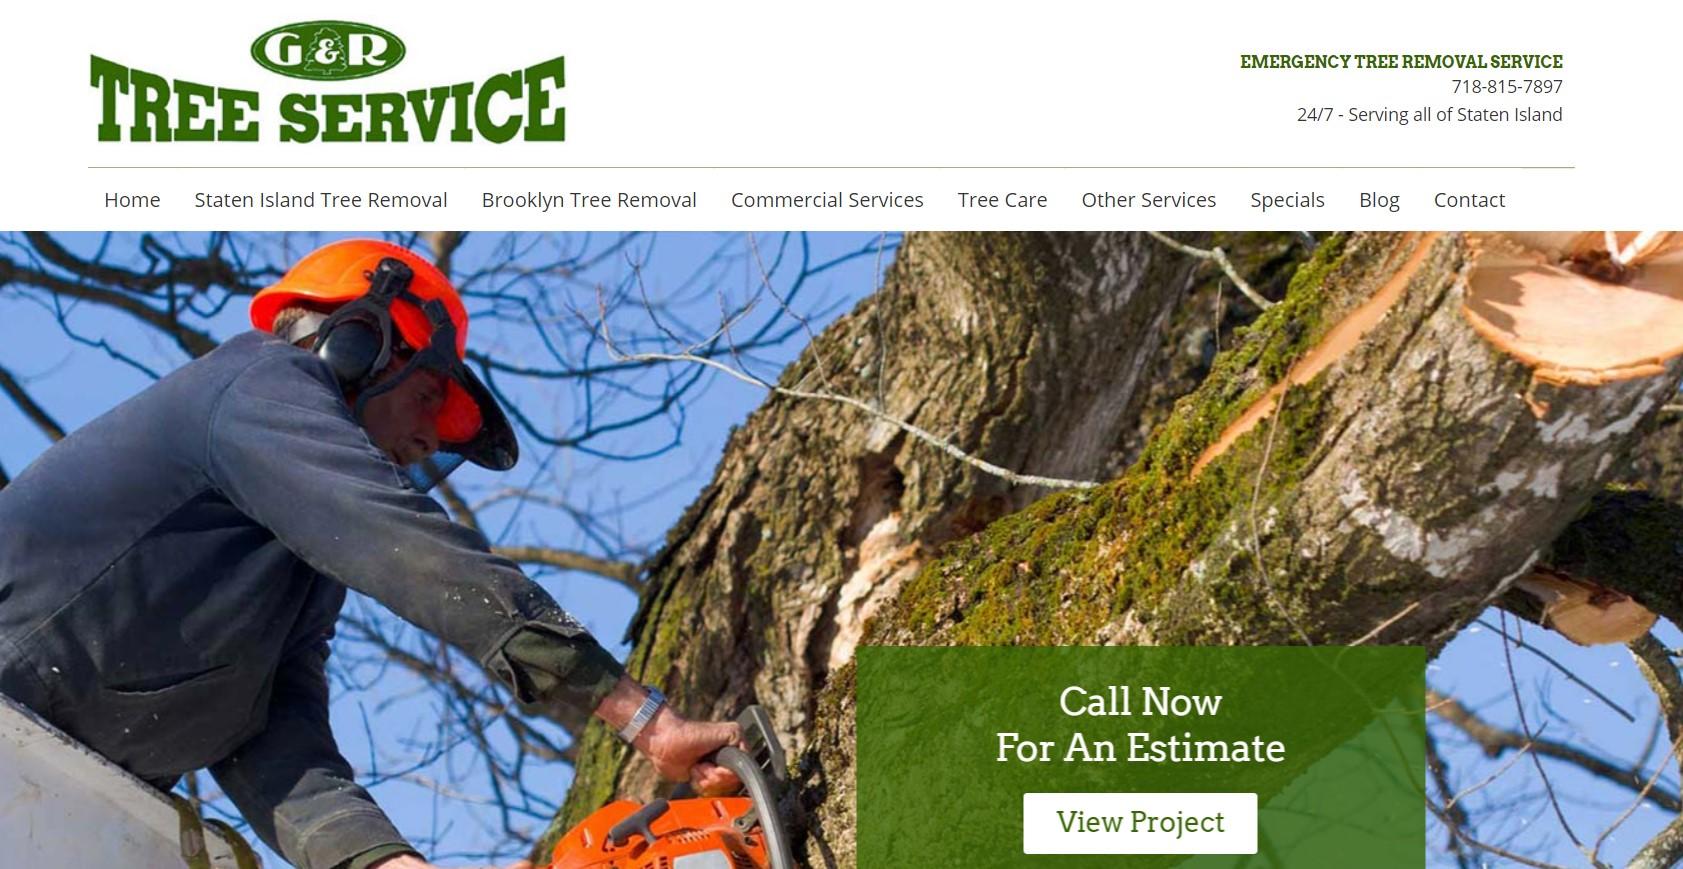 g&r tree service in new york